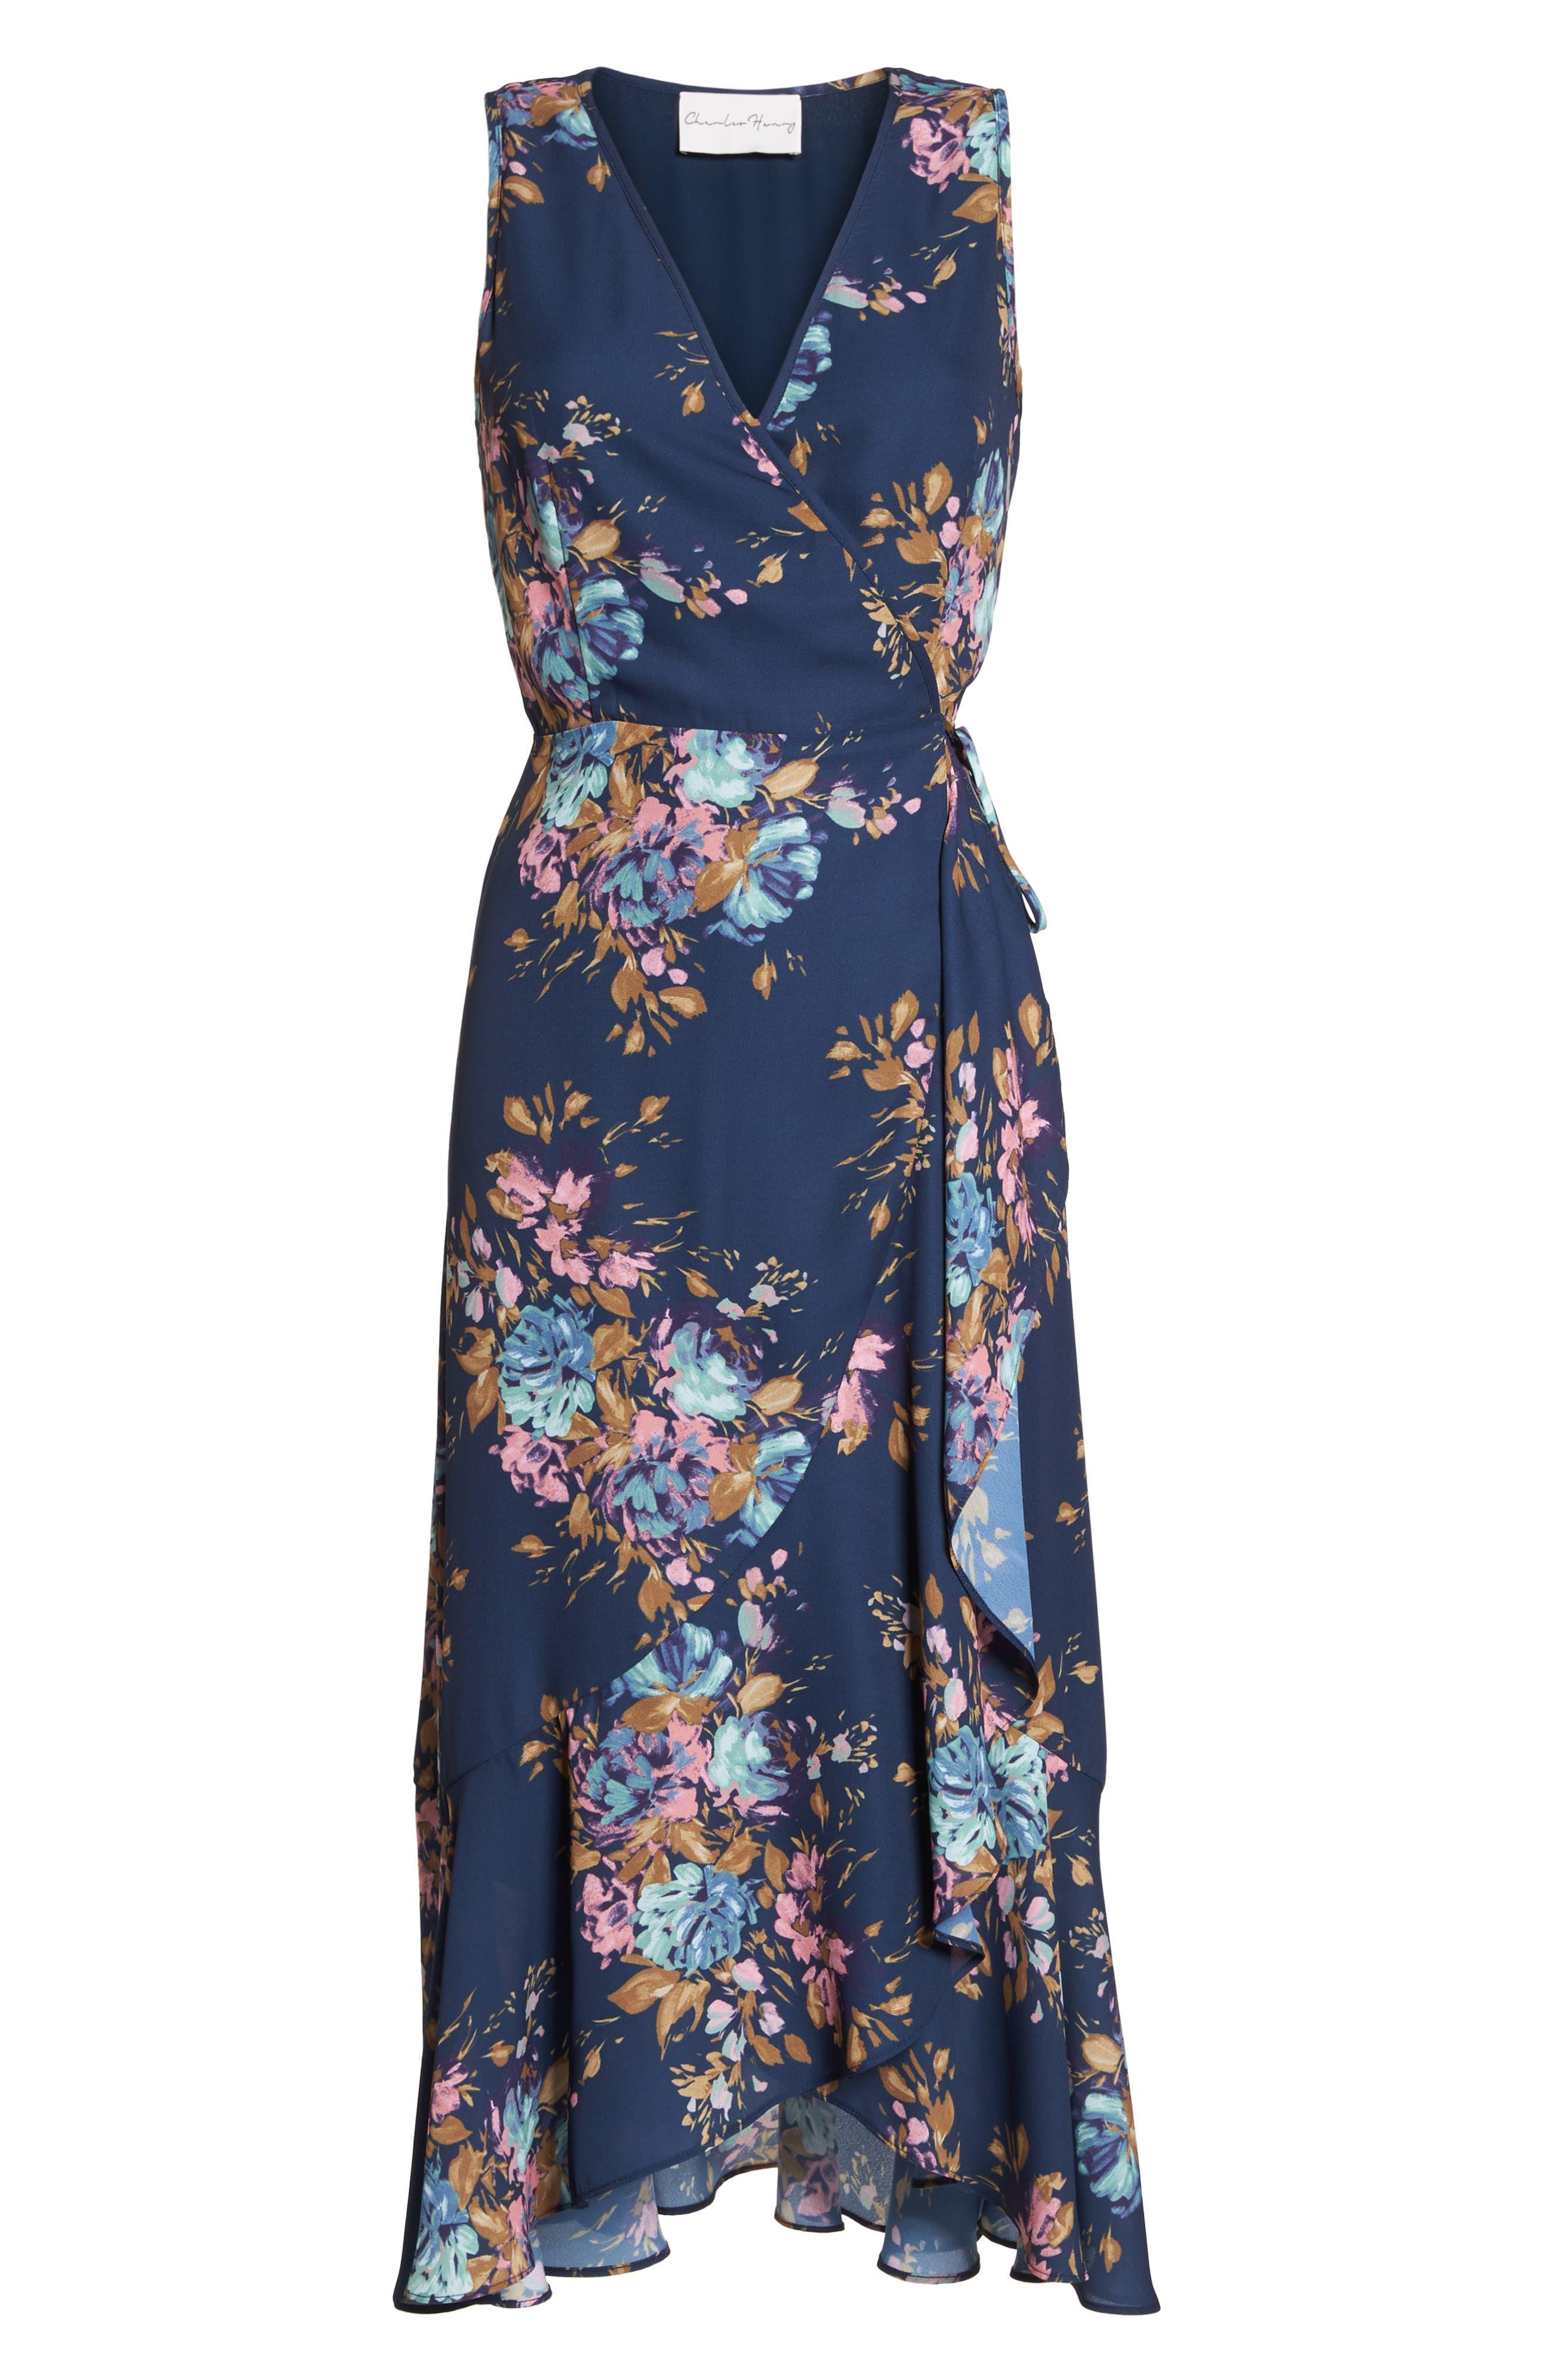 Floral Sleeveless Wrap Dress,                             Alternate thumbnail 7, color,                             473